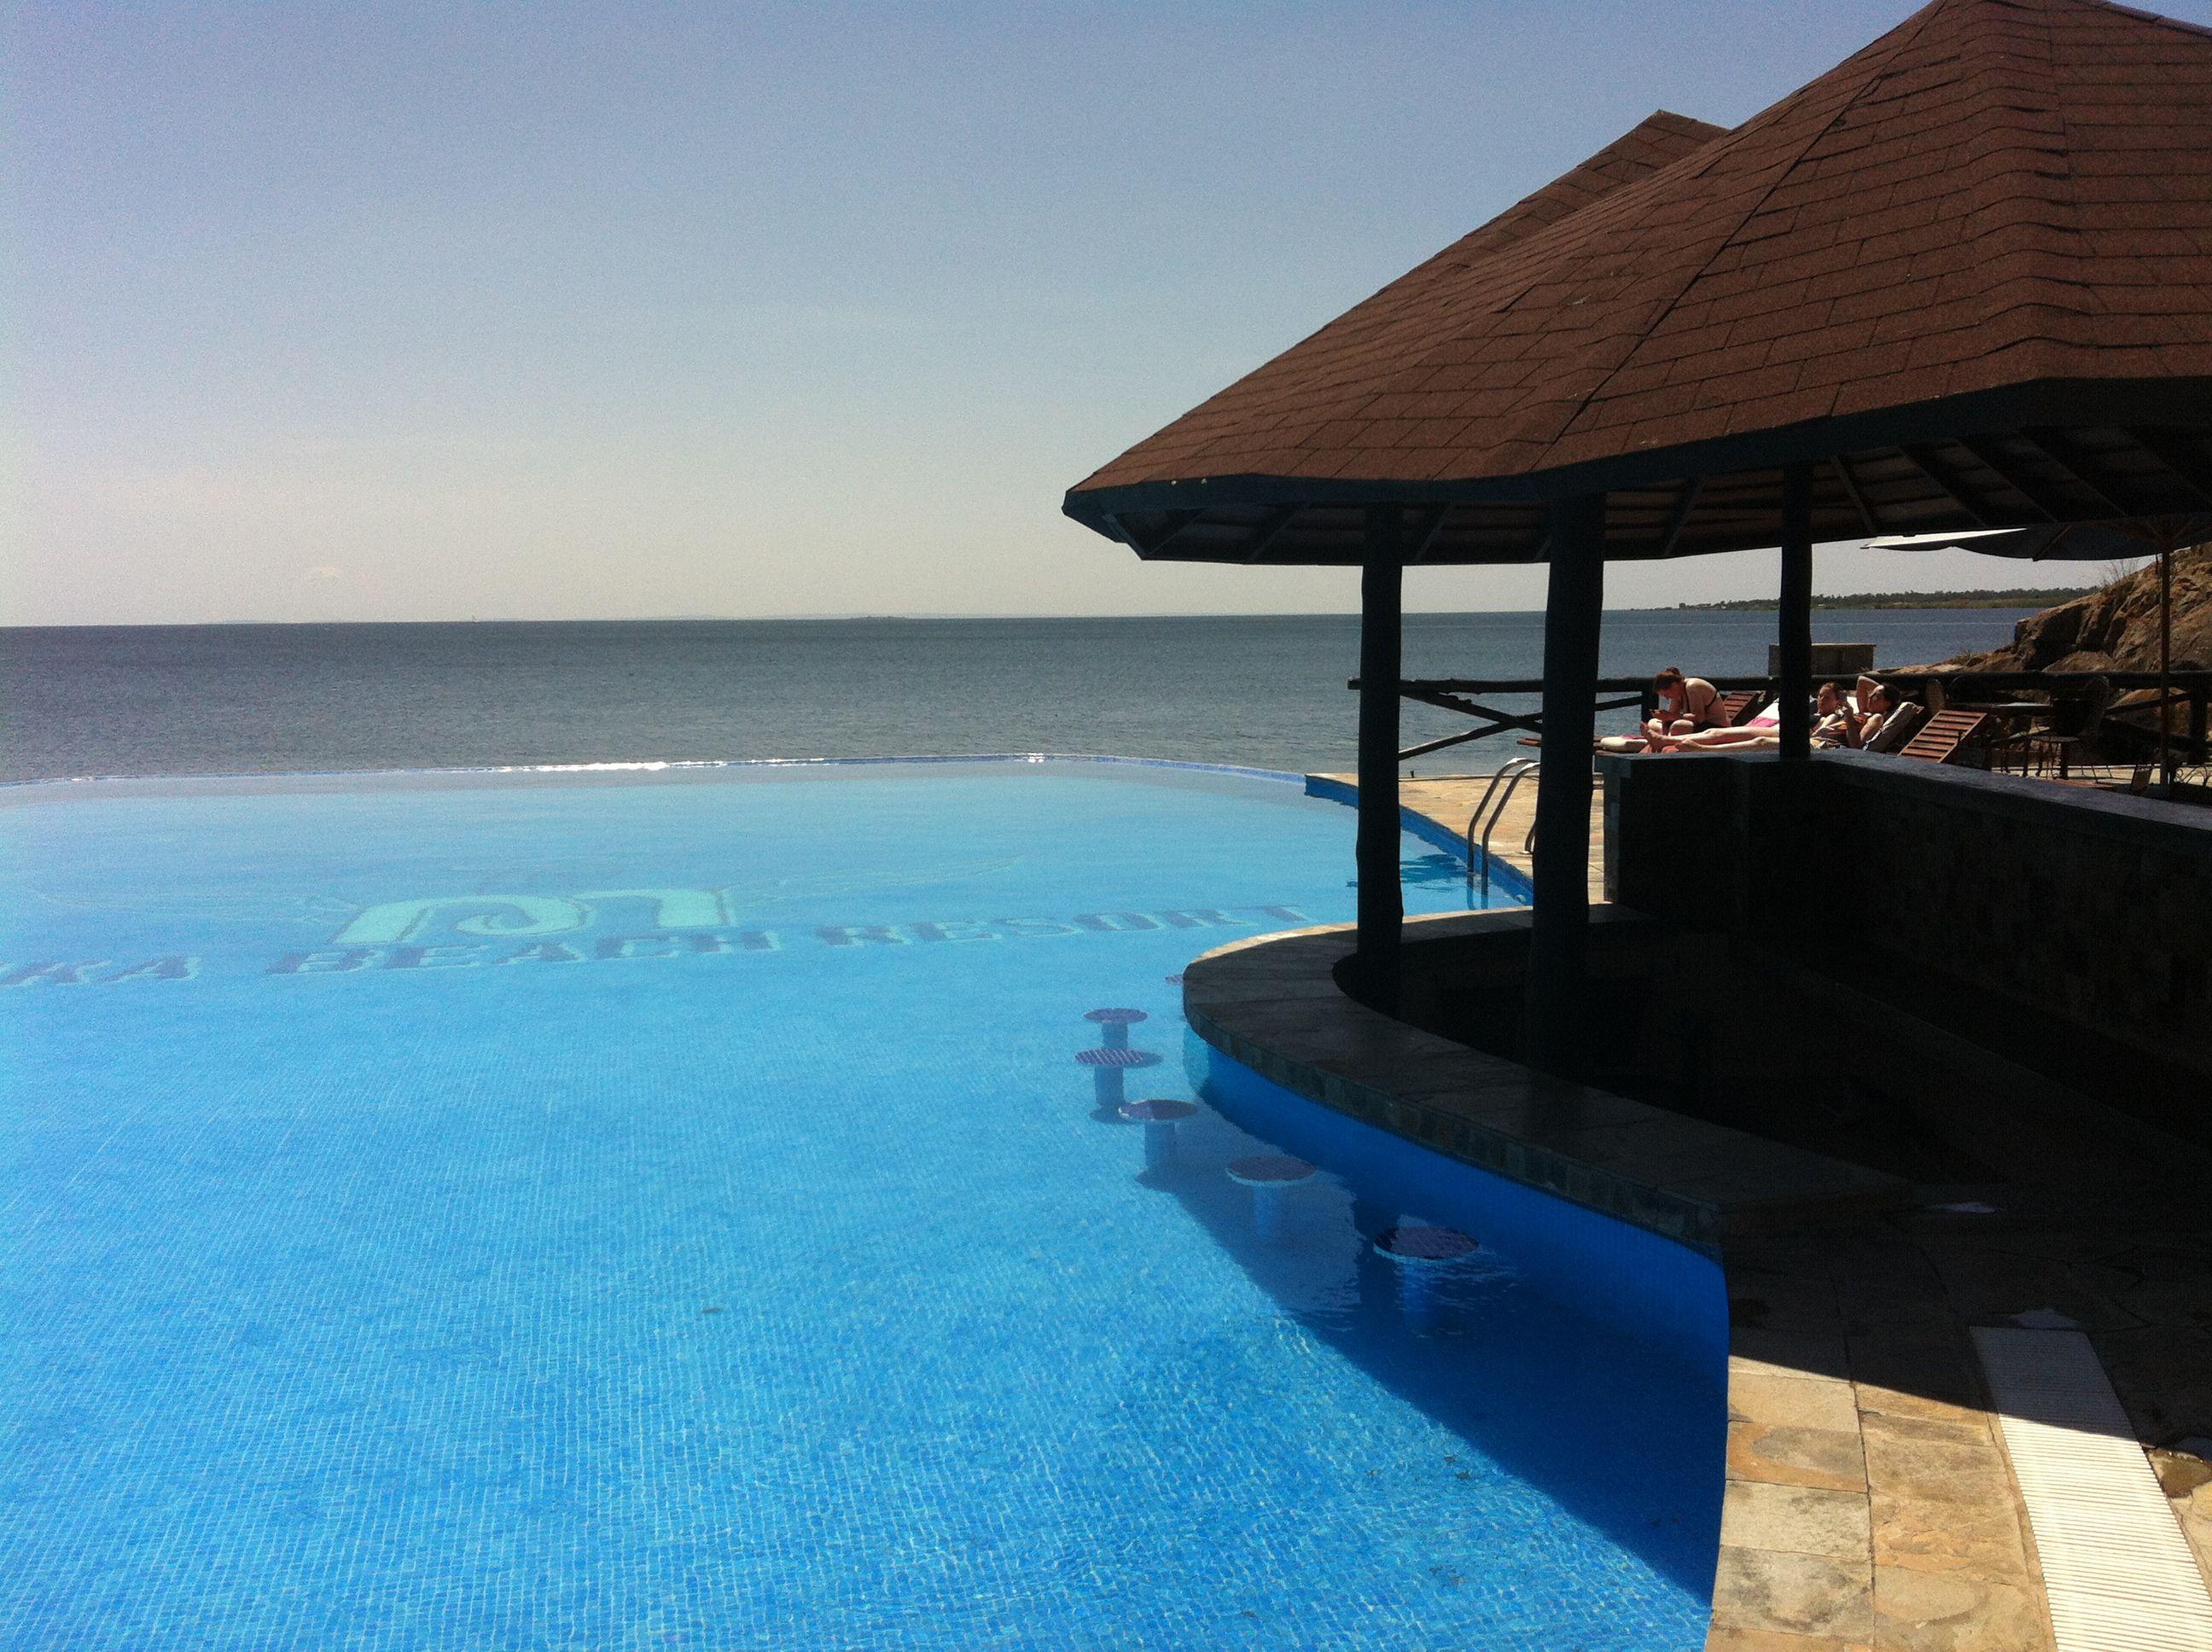 Malaika Beach Resort Mwanza Tanzania